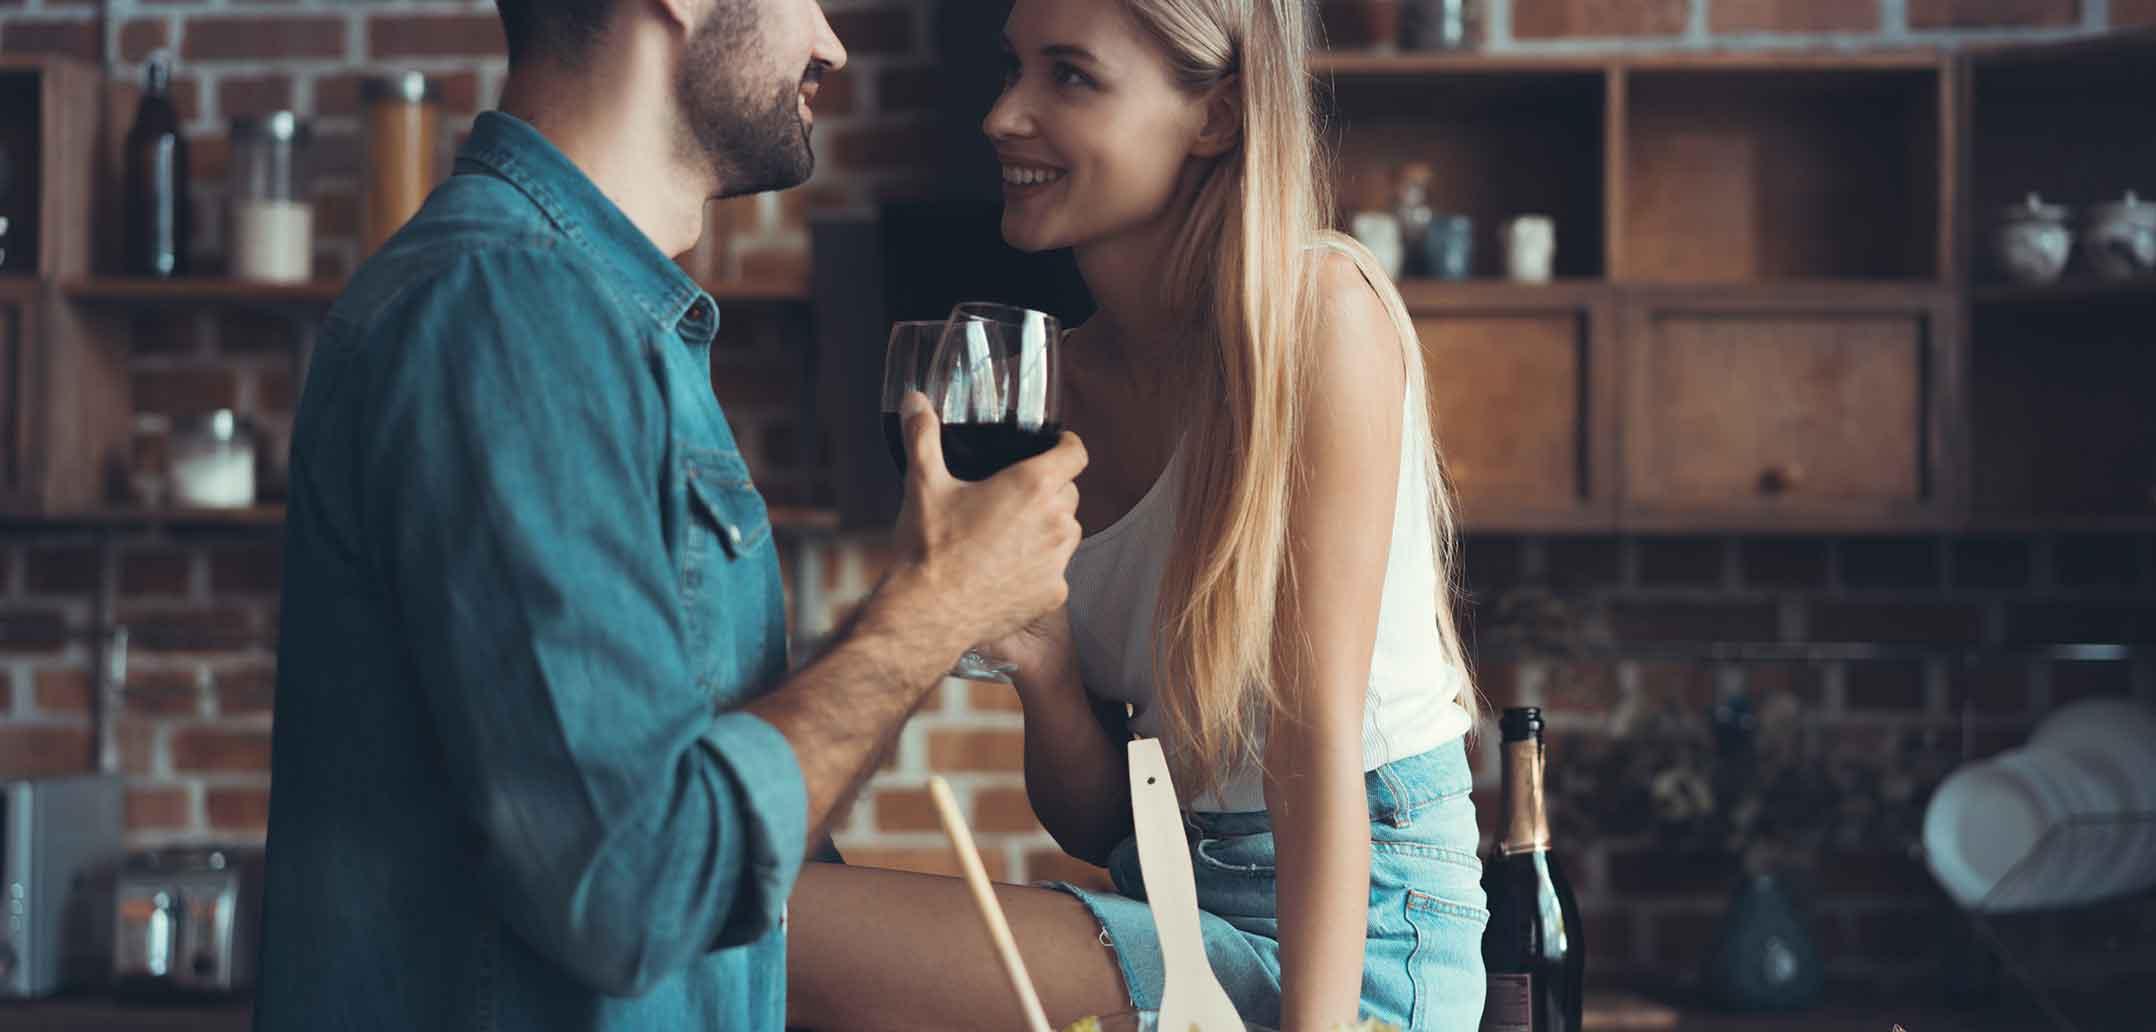 Alkohol in der Partnerschaft kann zu Stress führen